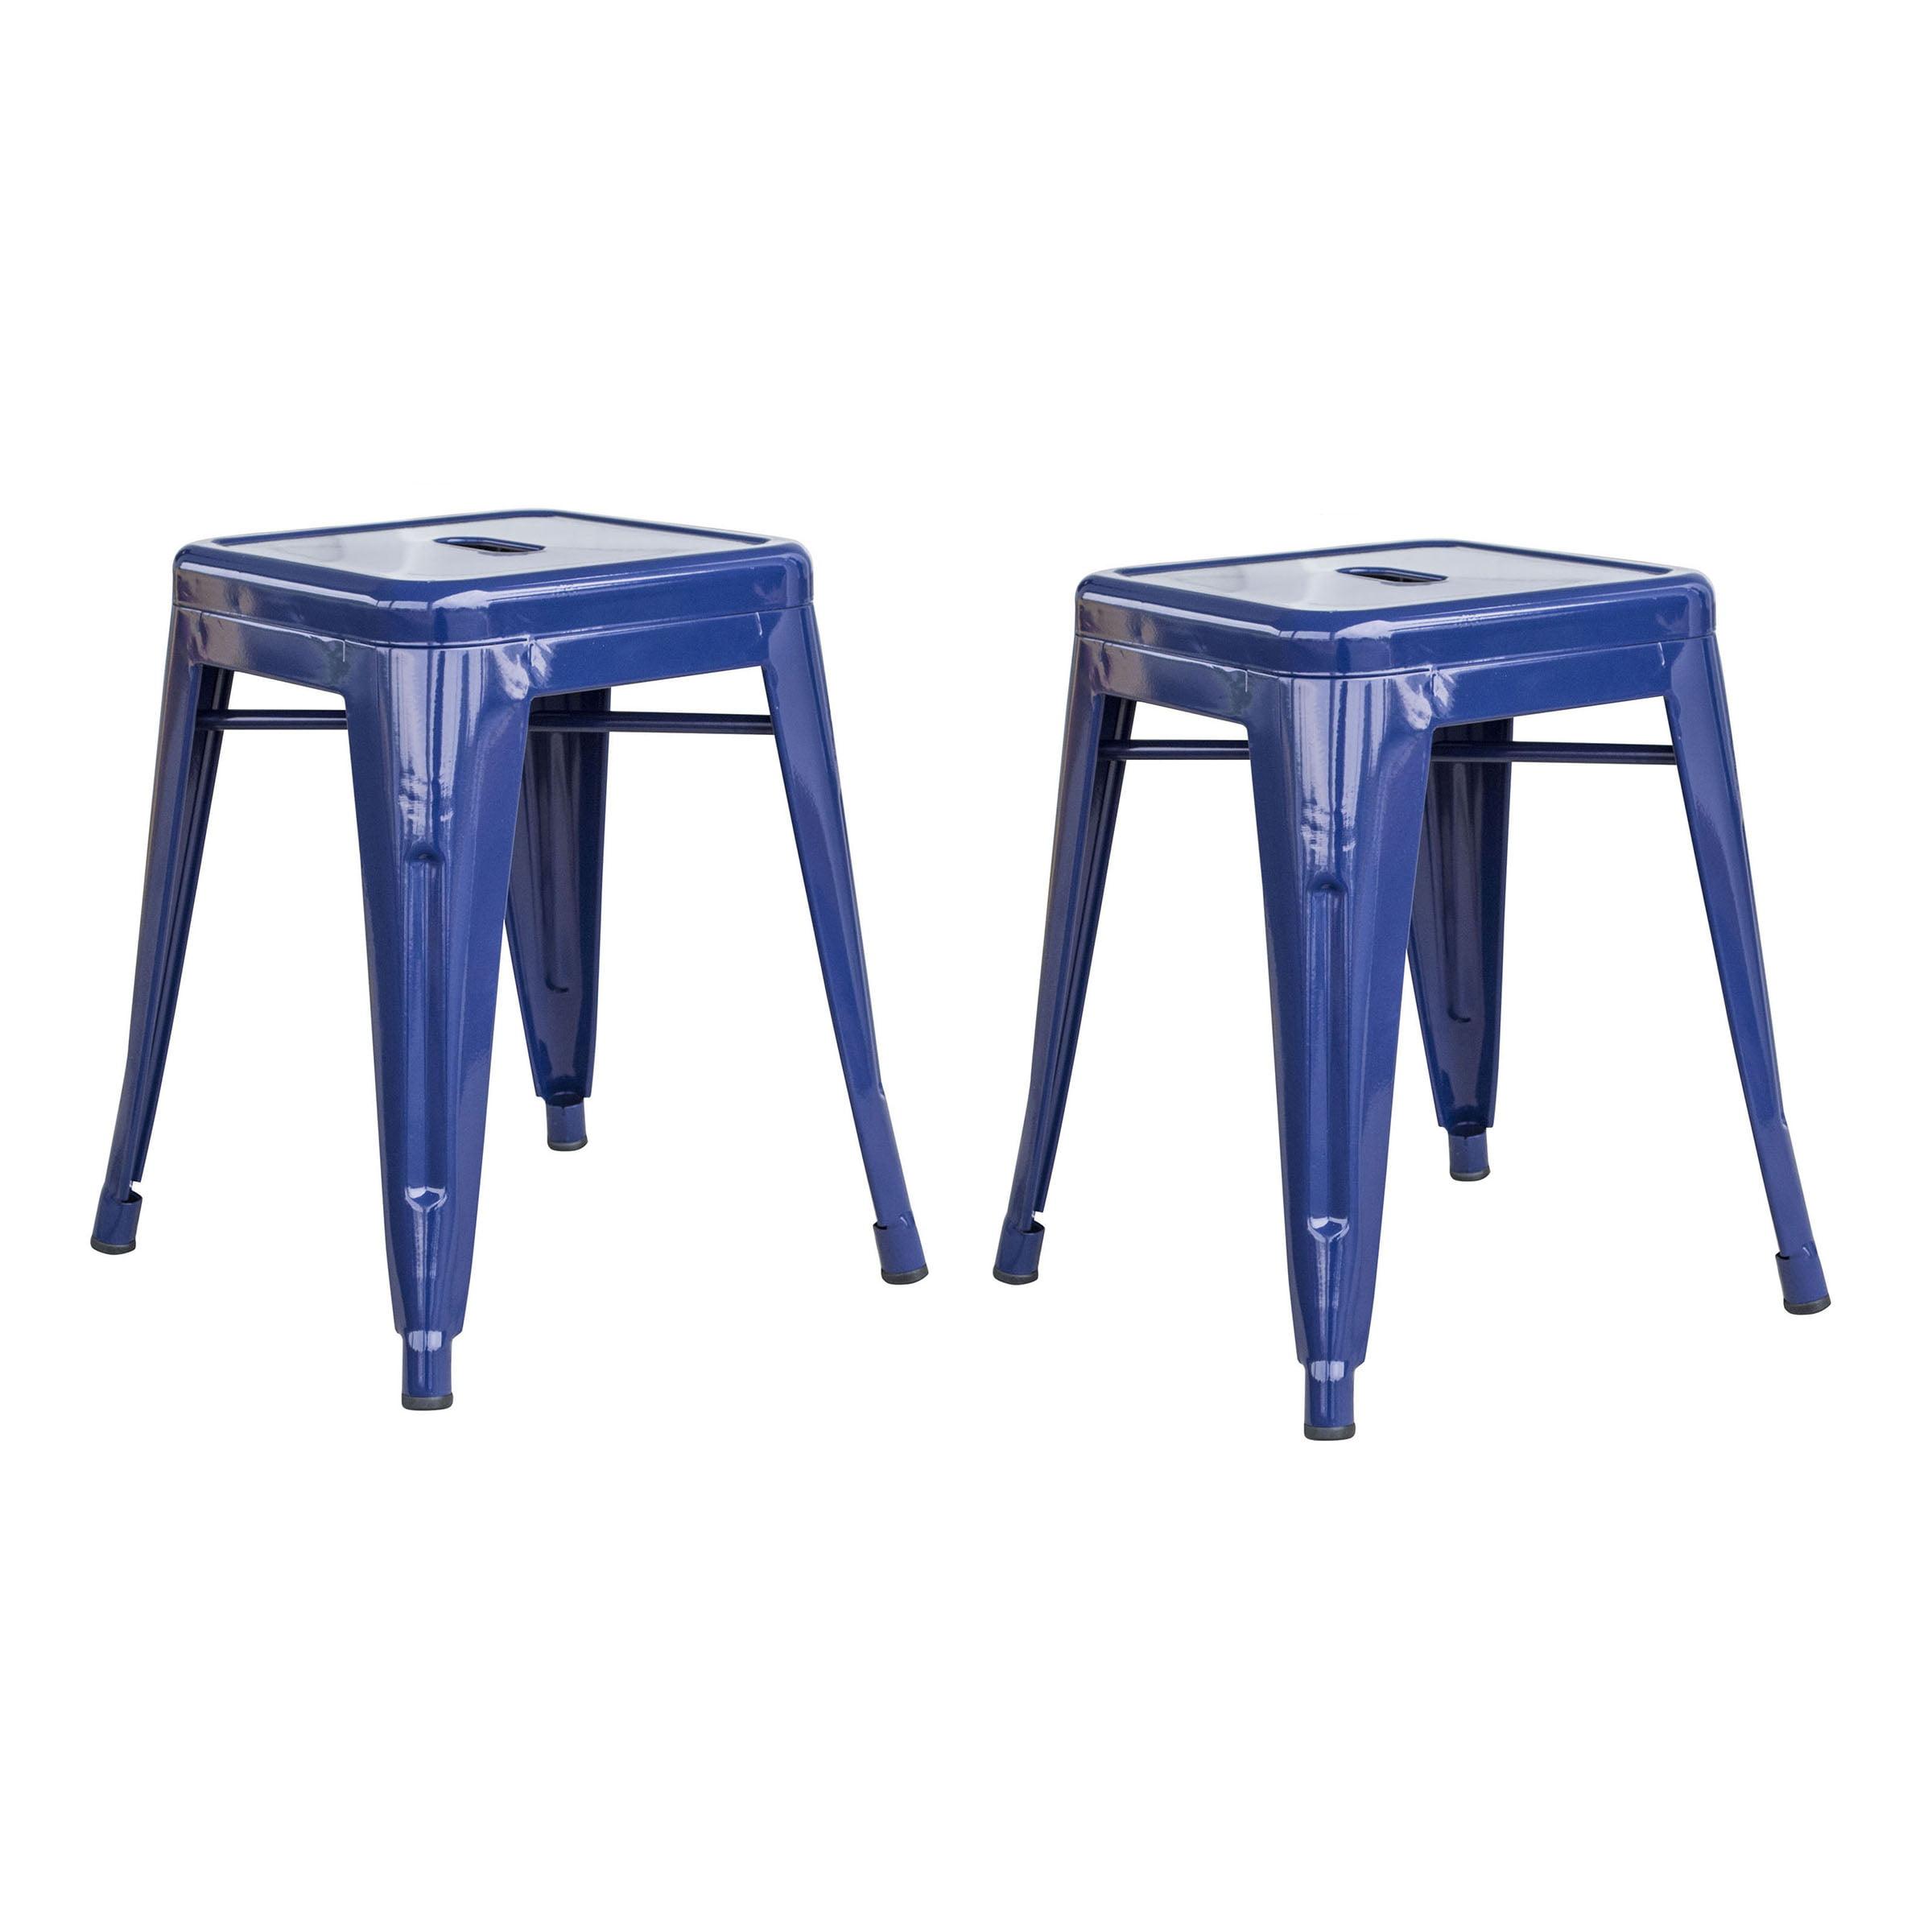 Amerihome Loft Blue 18 Inch Metal Bar Stool 2 Piece